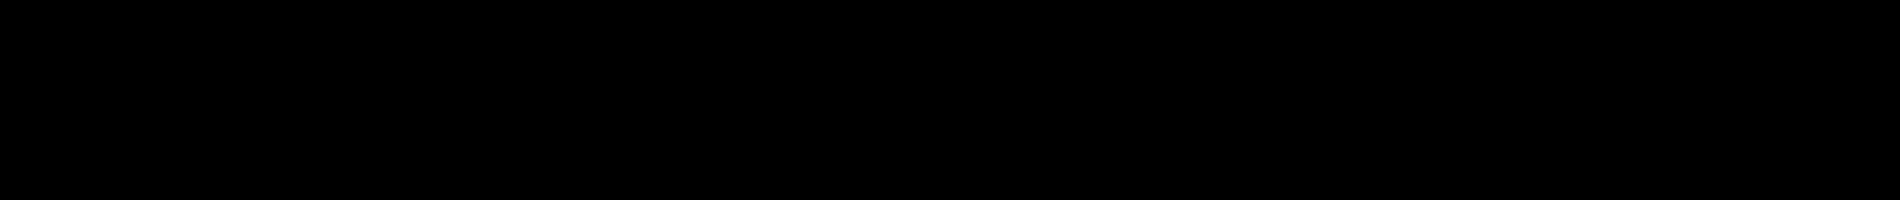 glow overlay ywkv65 - Jackie Bernardi Home Page